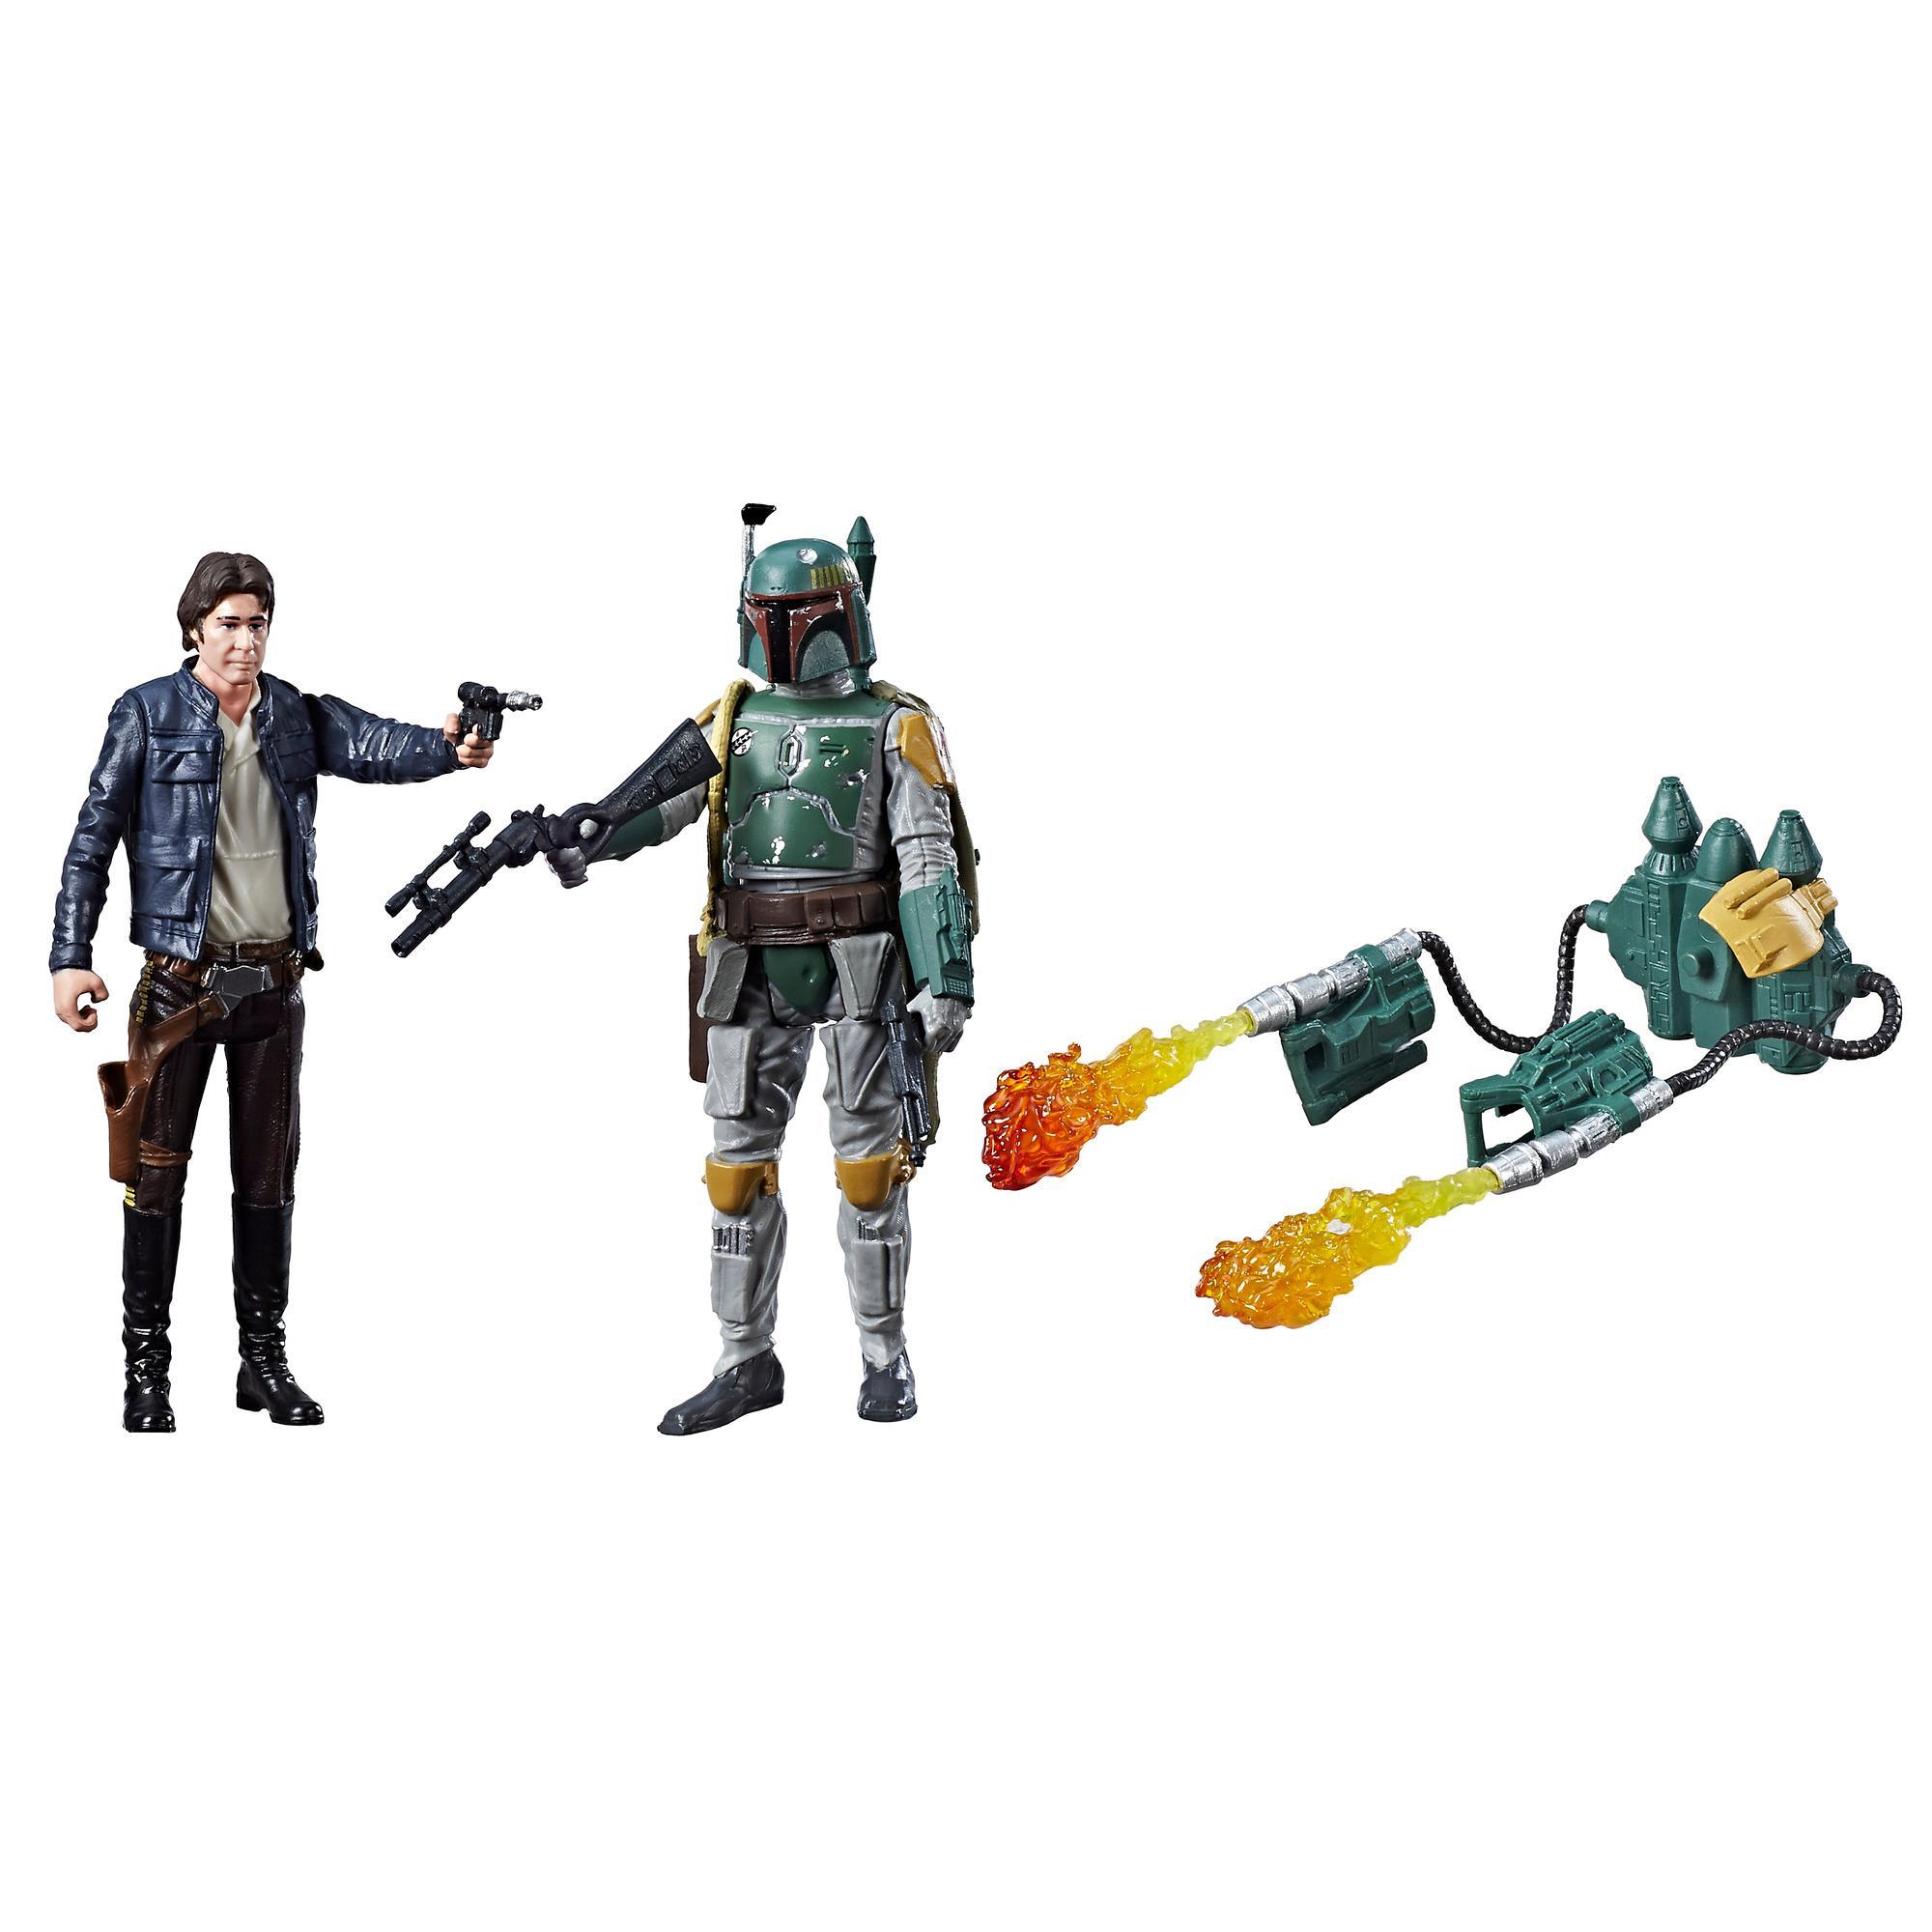 Star Wars - Duo de figurines Han Solo et Boba